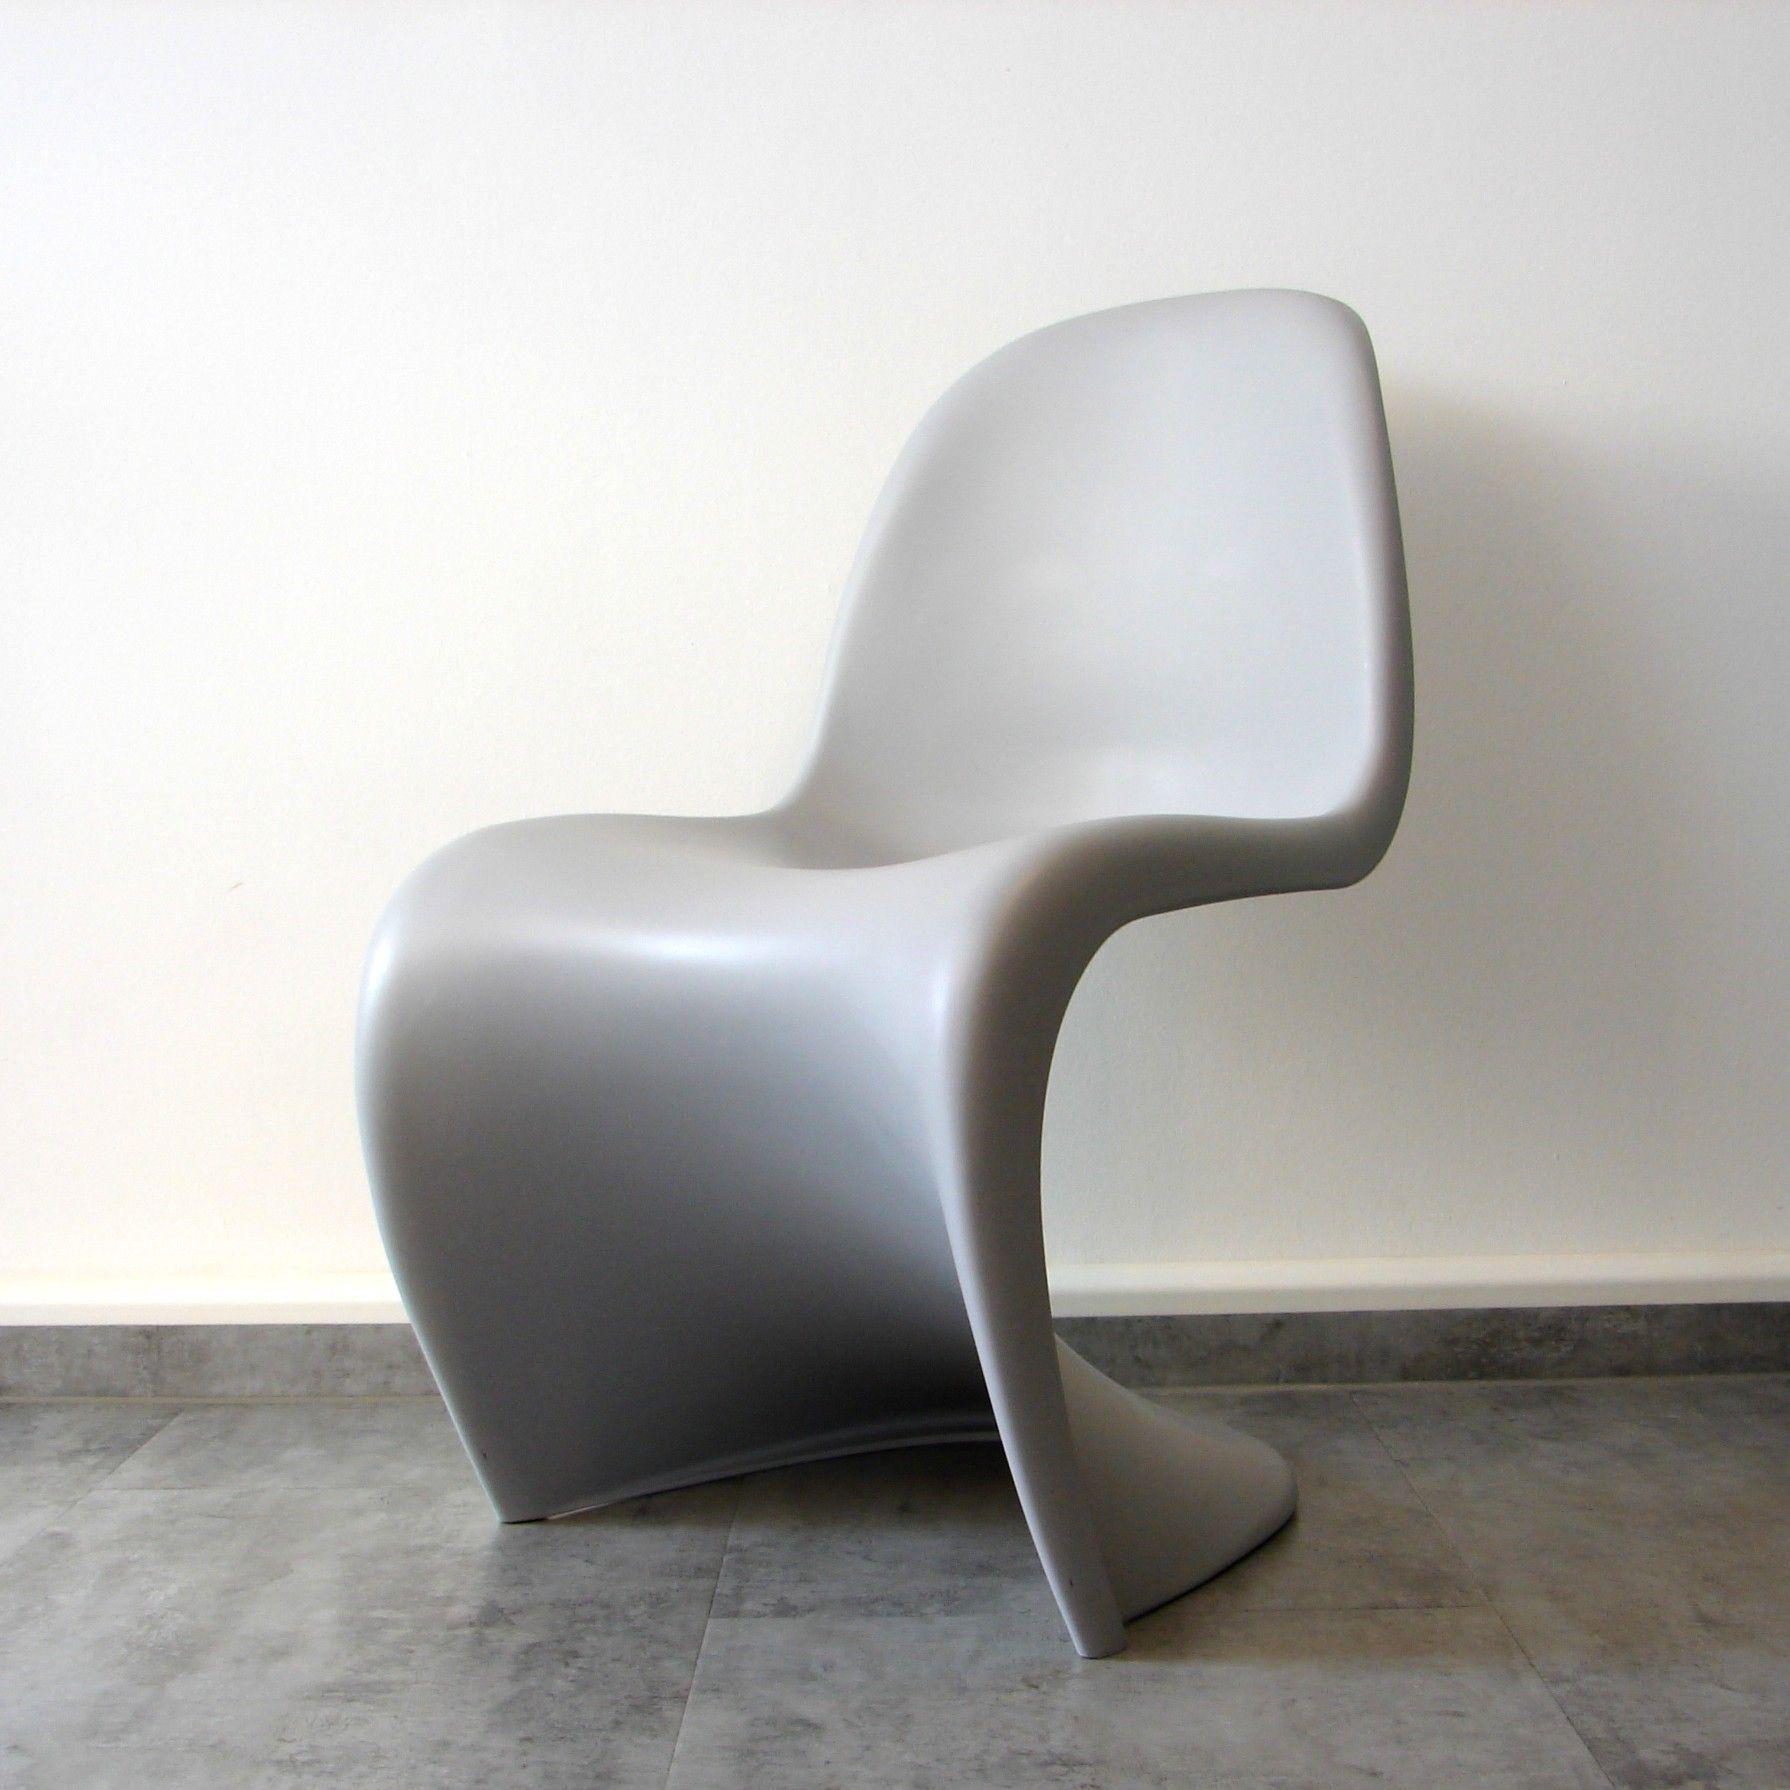 panton chair kinderstuhl panton chair verner panton vitra 03 2004 hellgrau sehr guter. Black Bedroom Furniture Sets. Home Design Ideas